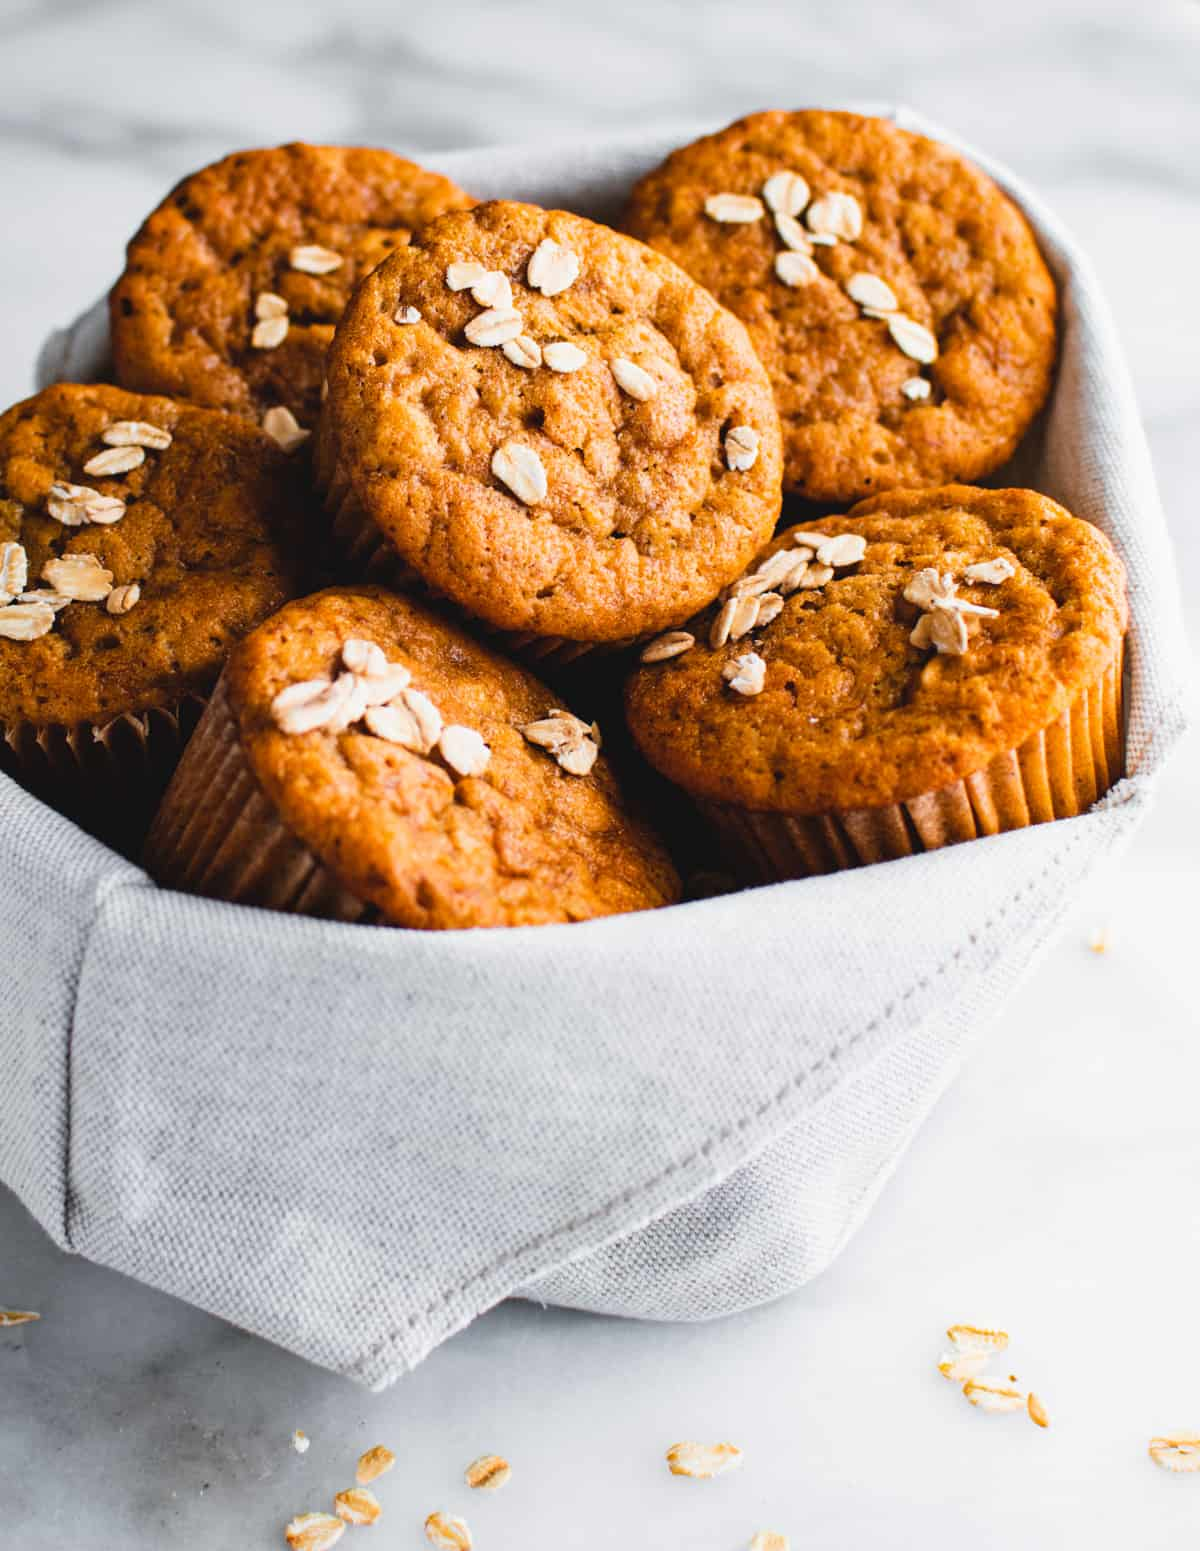 Banana Oatmeal Muffins in a cloth basket